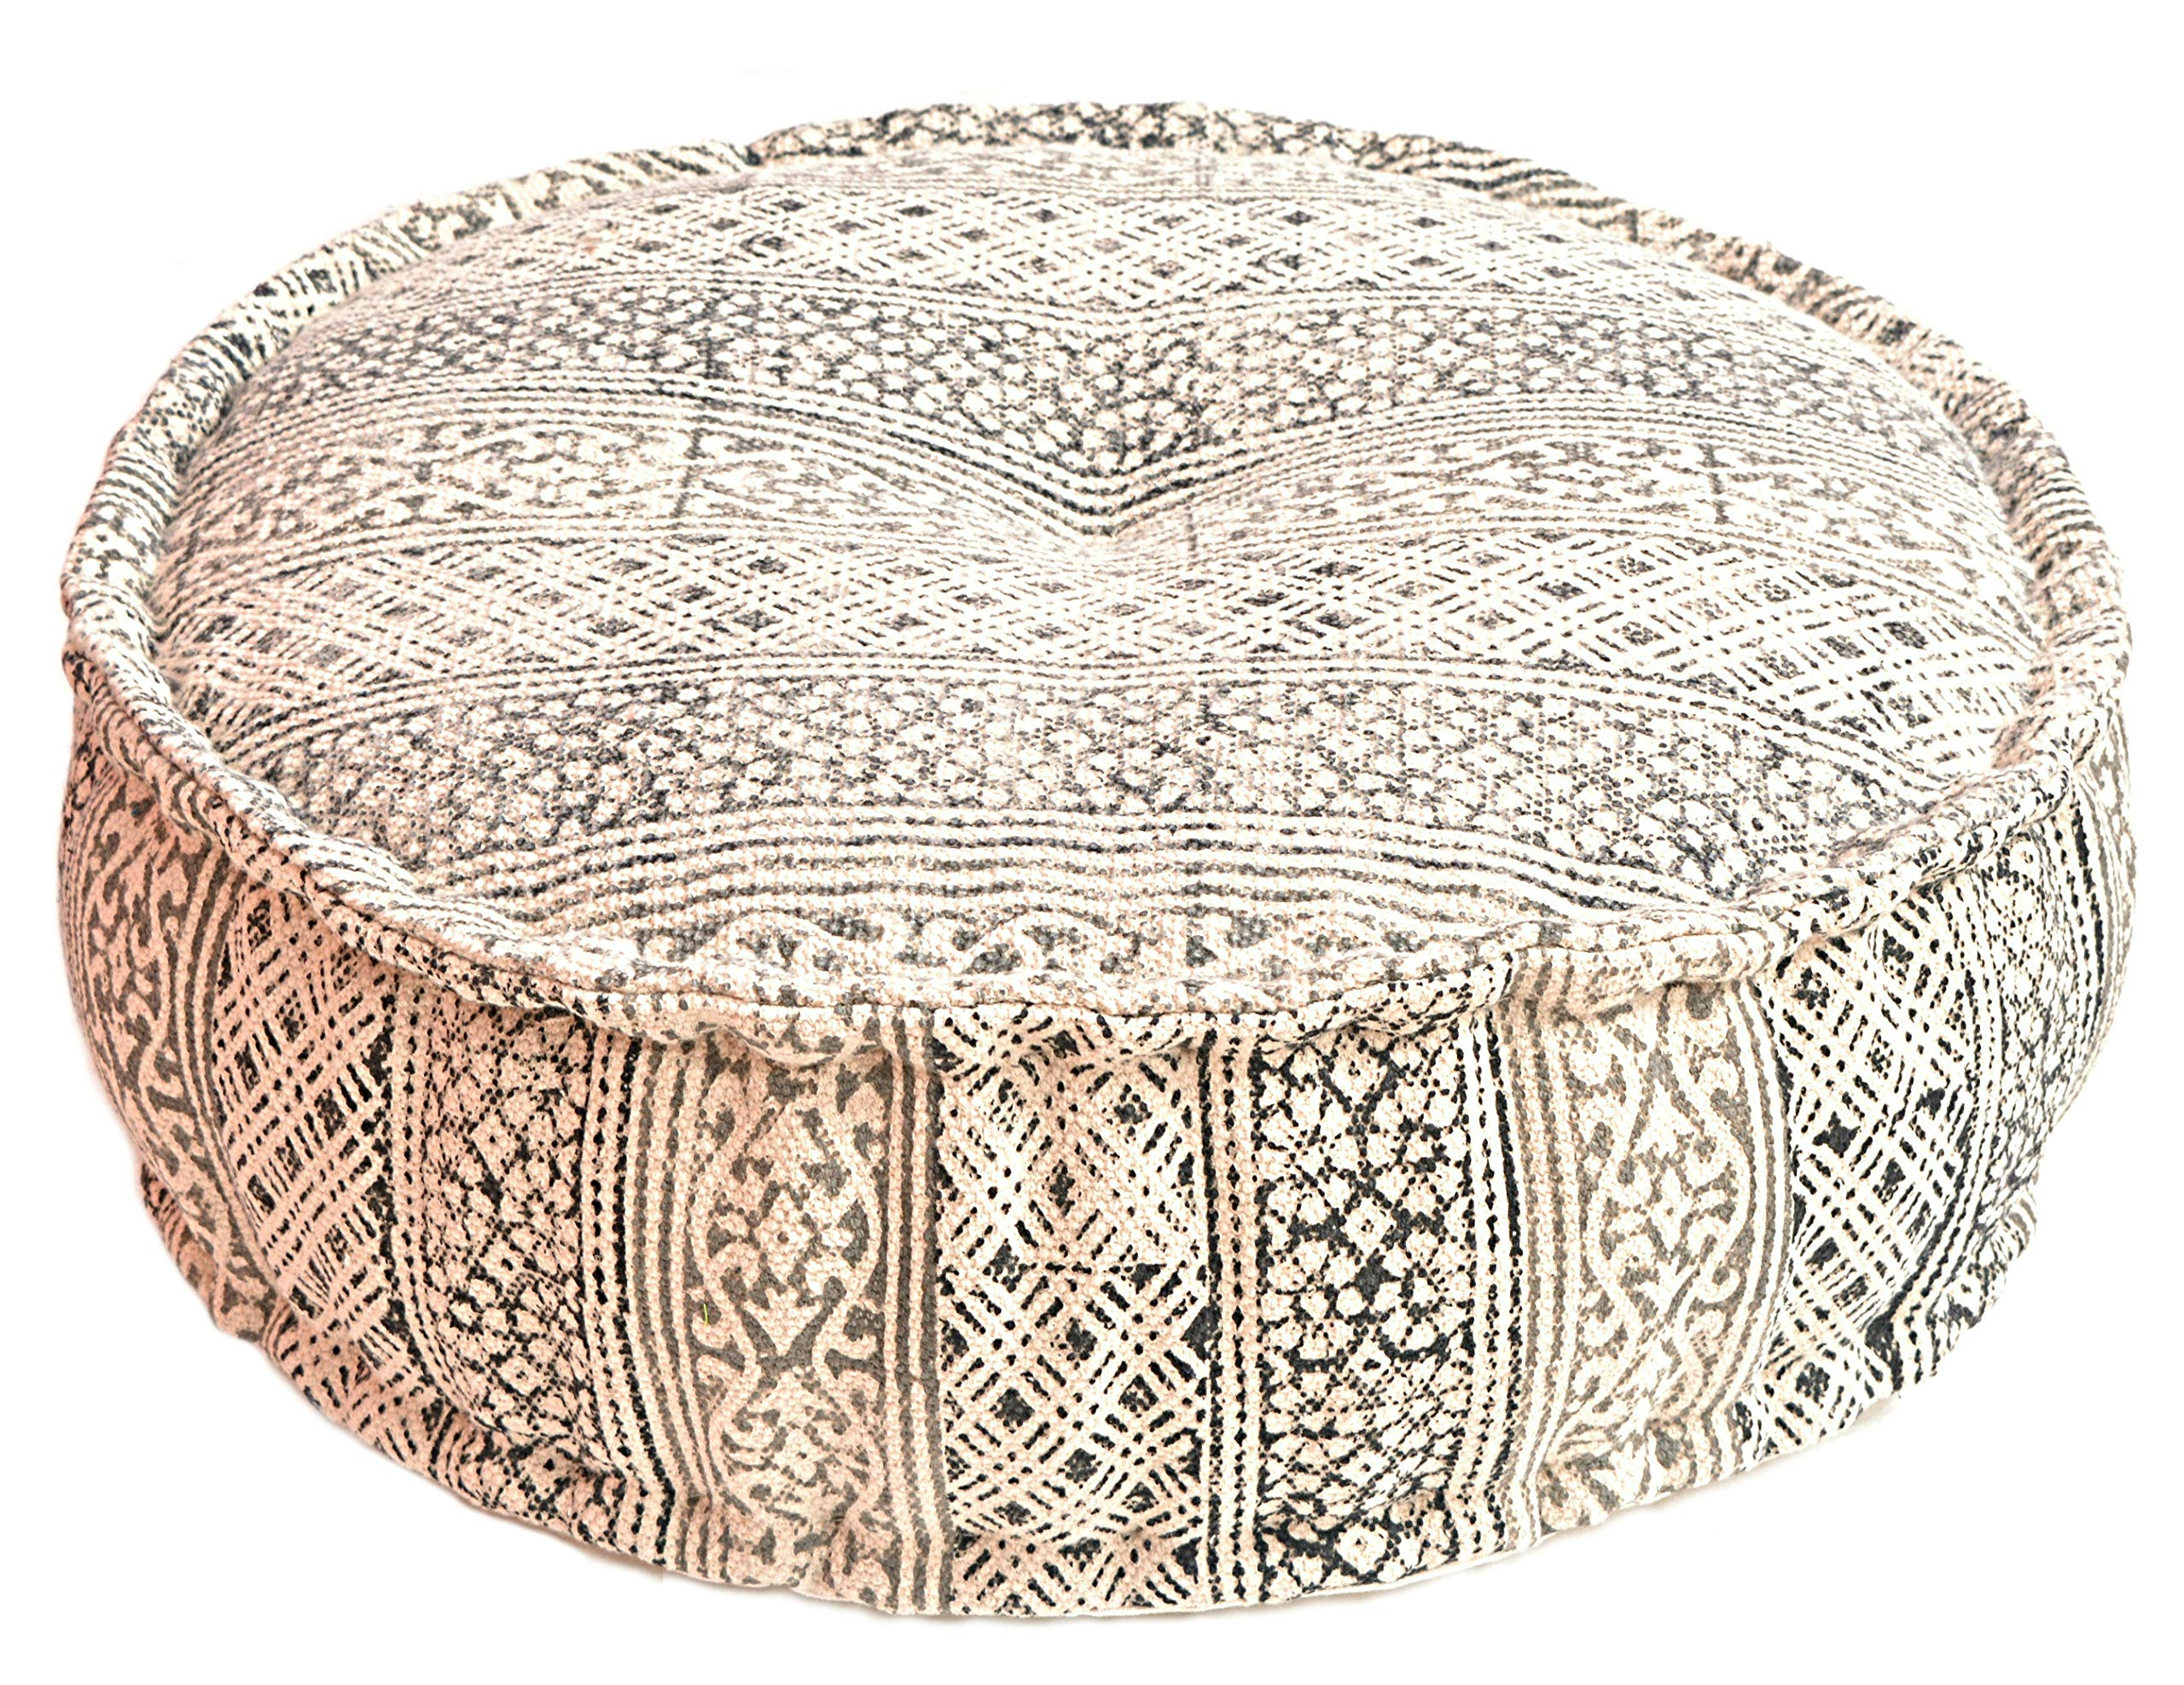 MARUDHARA Kilim Durry Cloth Stuffed Pouf 24''X8'', Round Pouf, Dhurrie Pouffe, Ottoman Extra Sitting, Floor Cushion, Foot Stool by MARUDHARA